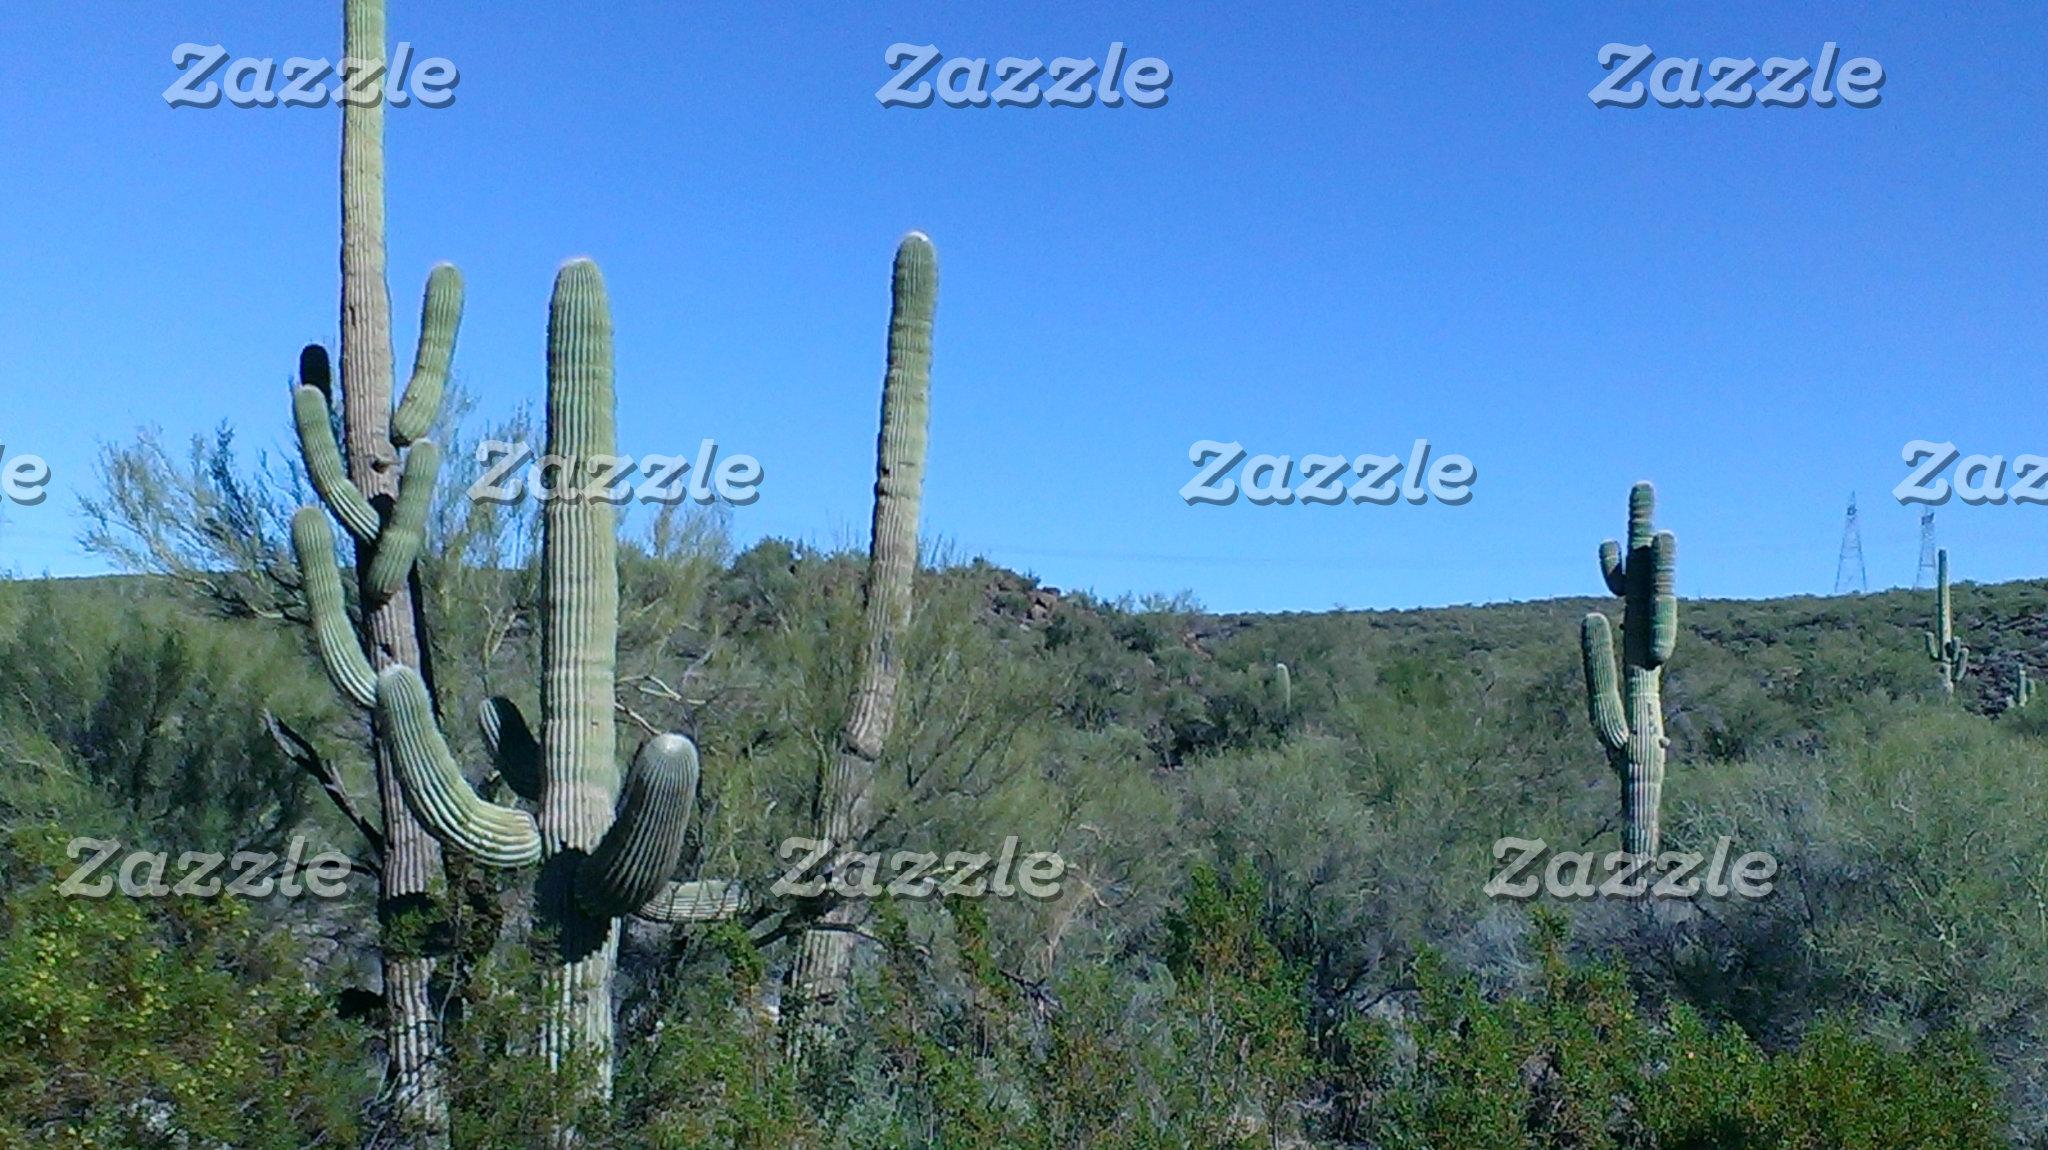 Creative Cacti